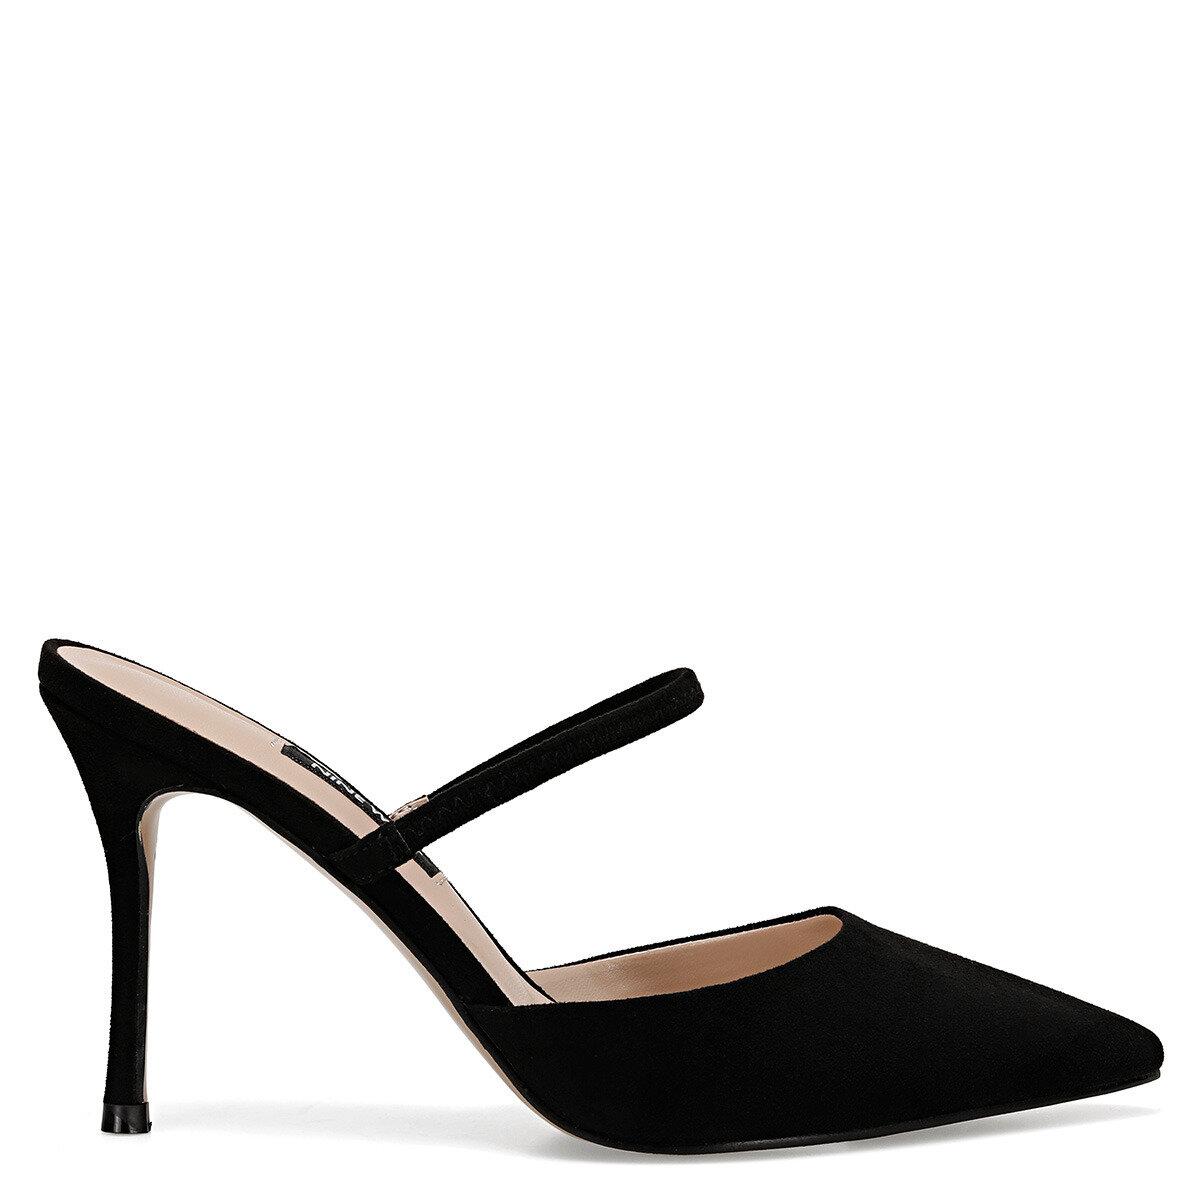 TIGO2 Siyah Kadın Stiletto